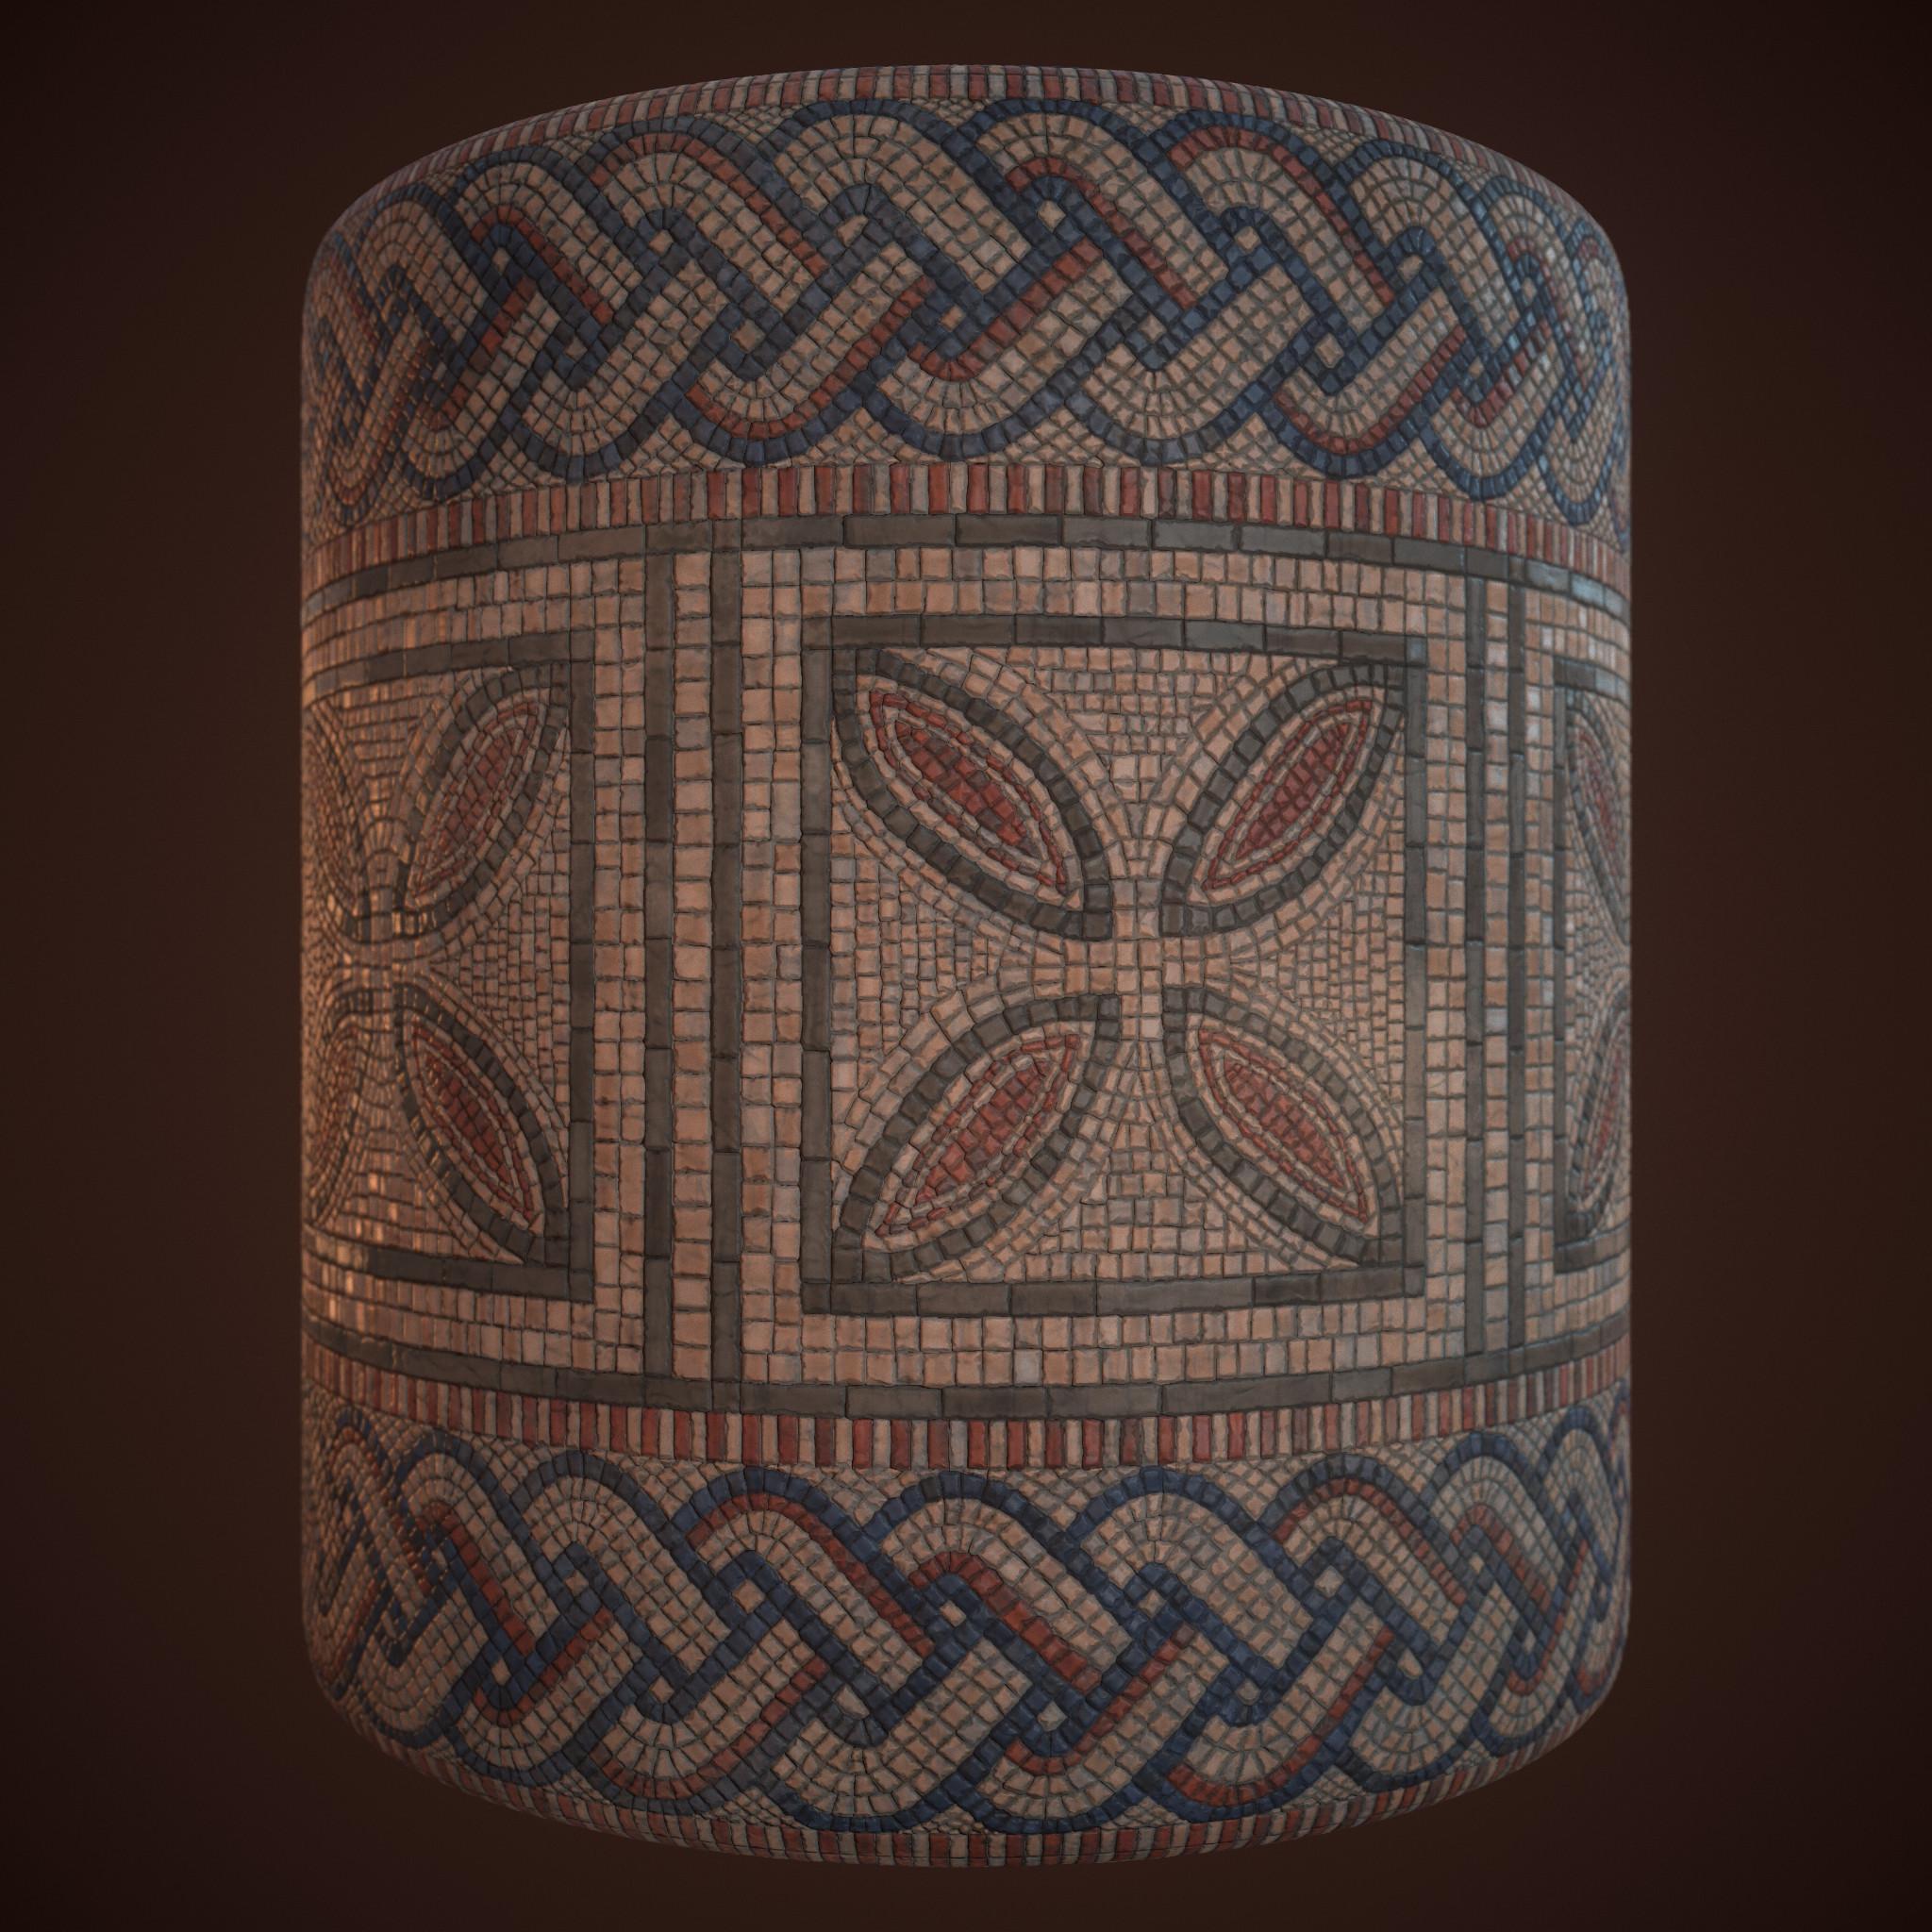 Mosaic floor cylindrical render